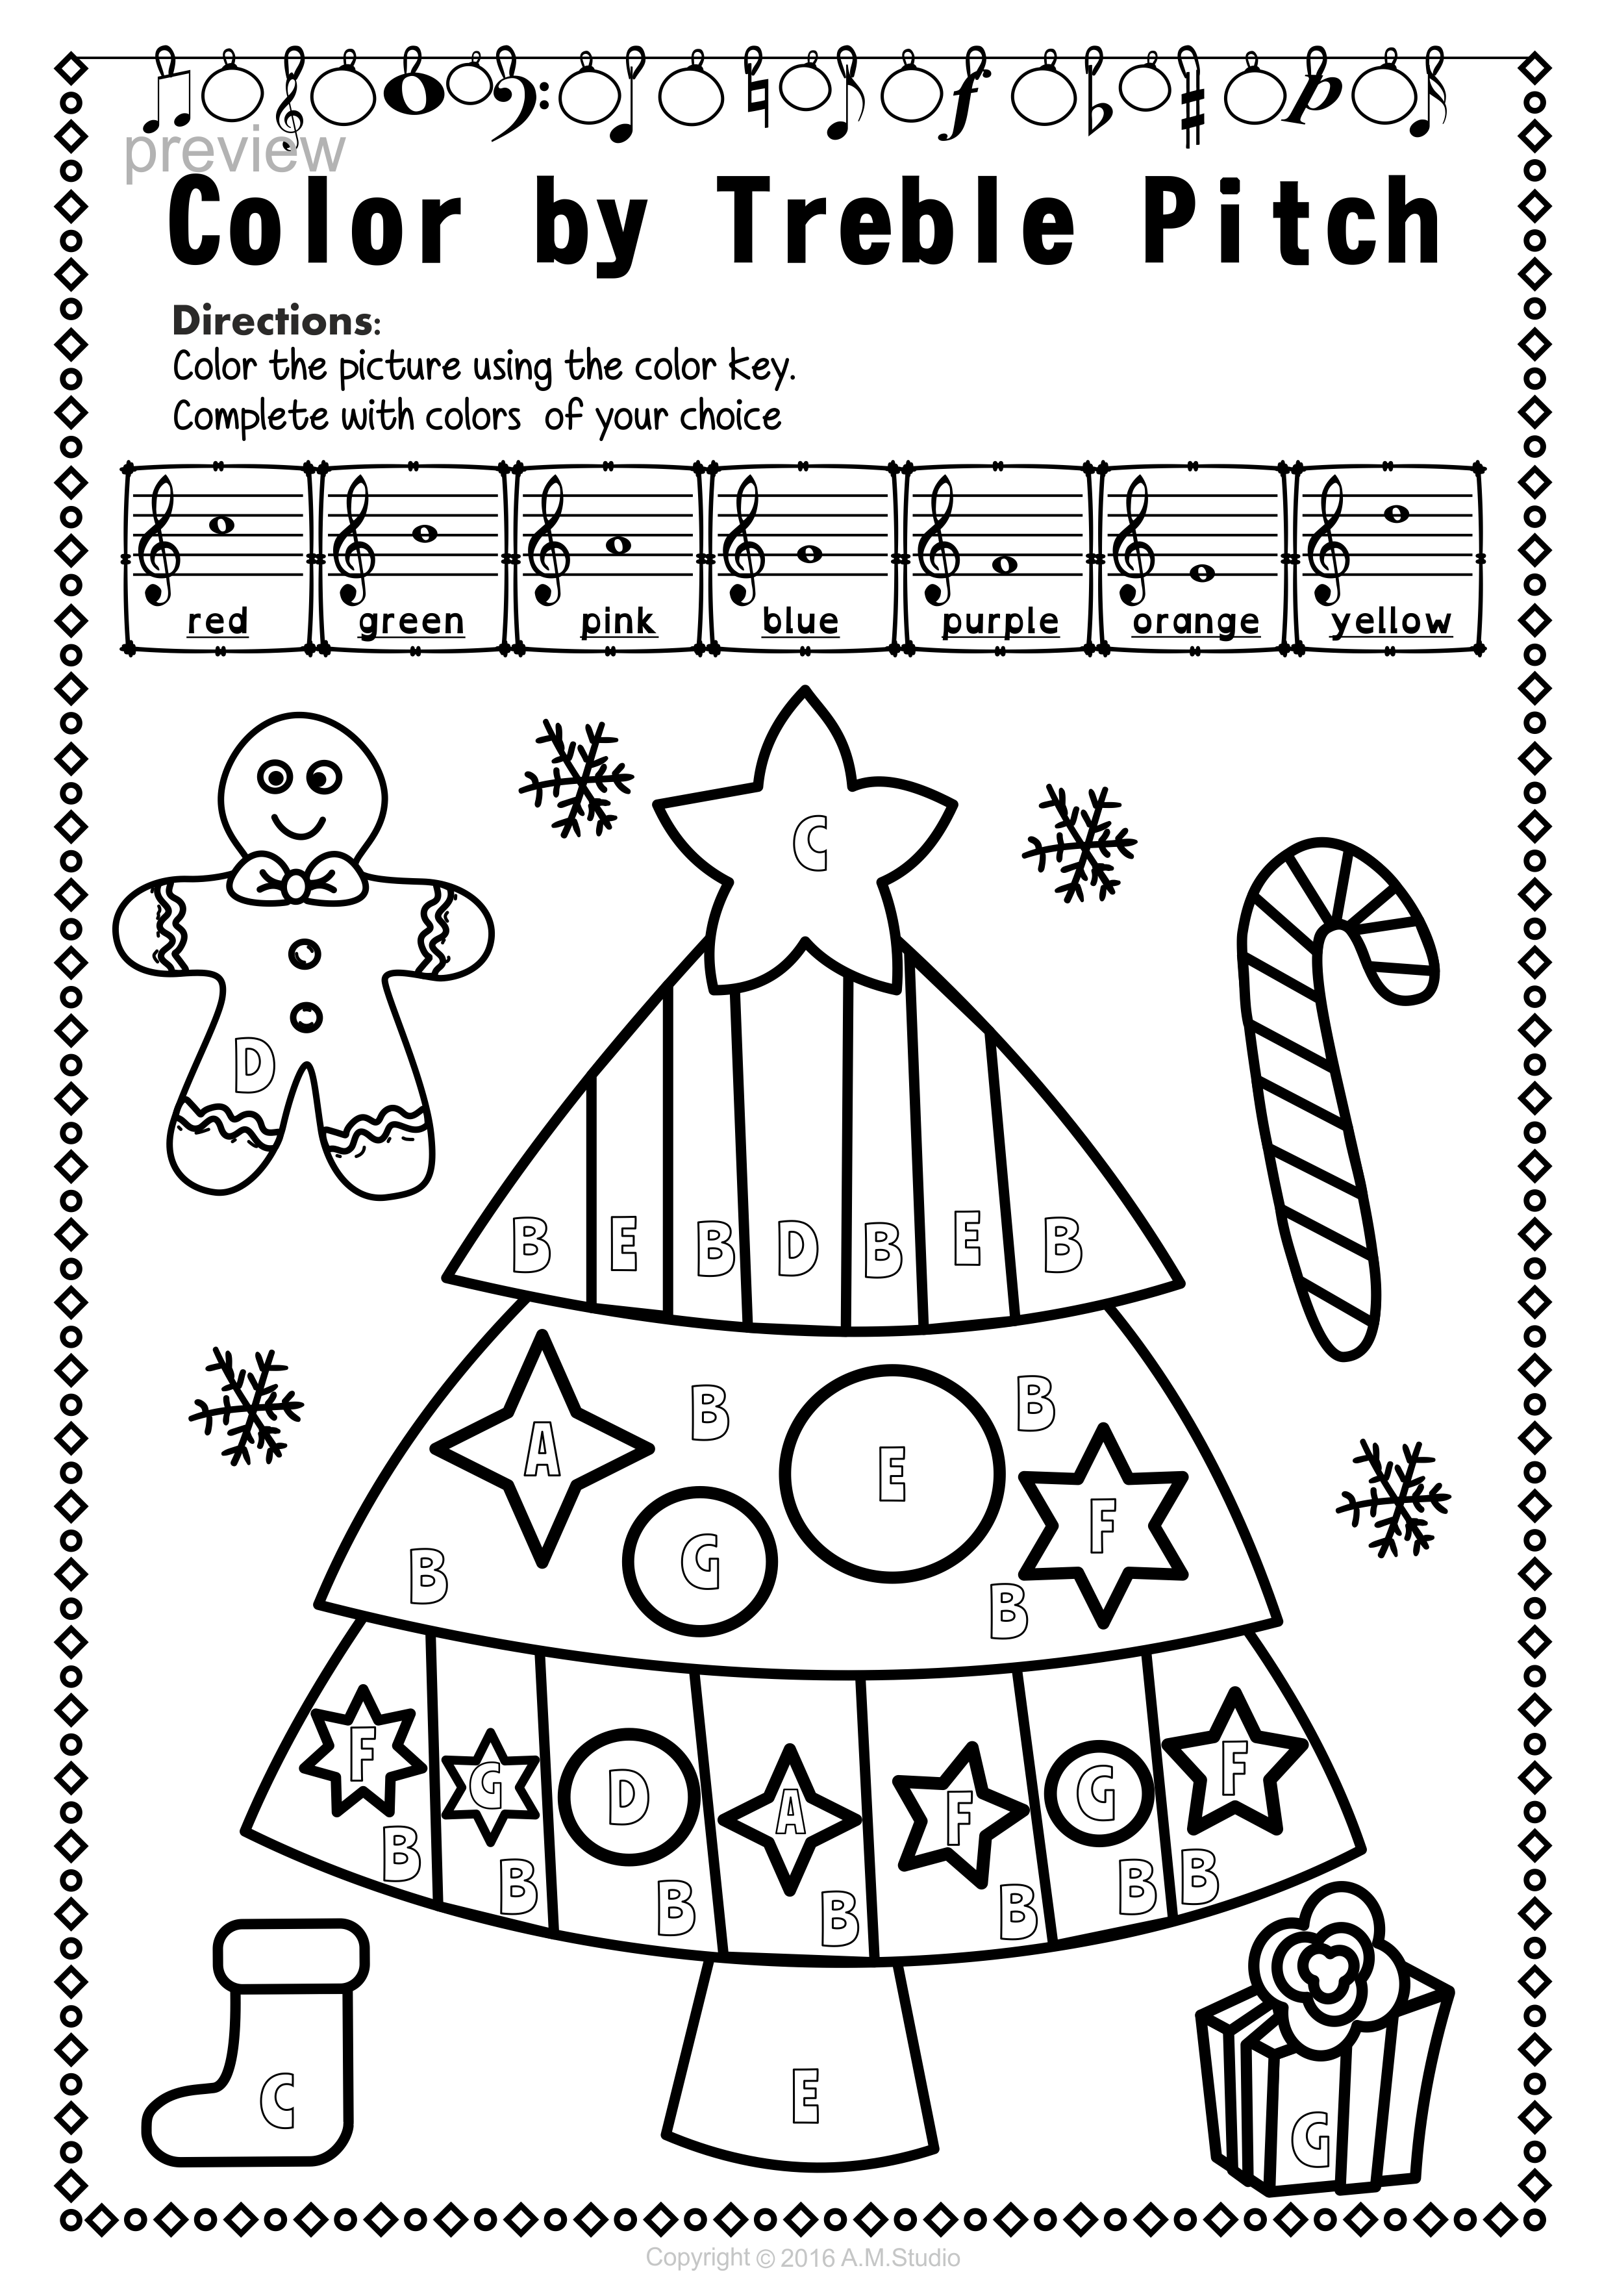 FREE CHRISTMAS MUSIC LISTENING WORKSHEETS - TeachersPayTeachers ...